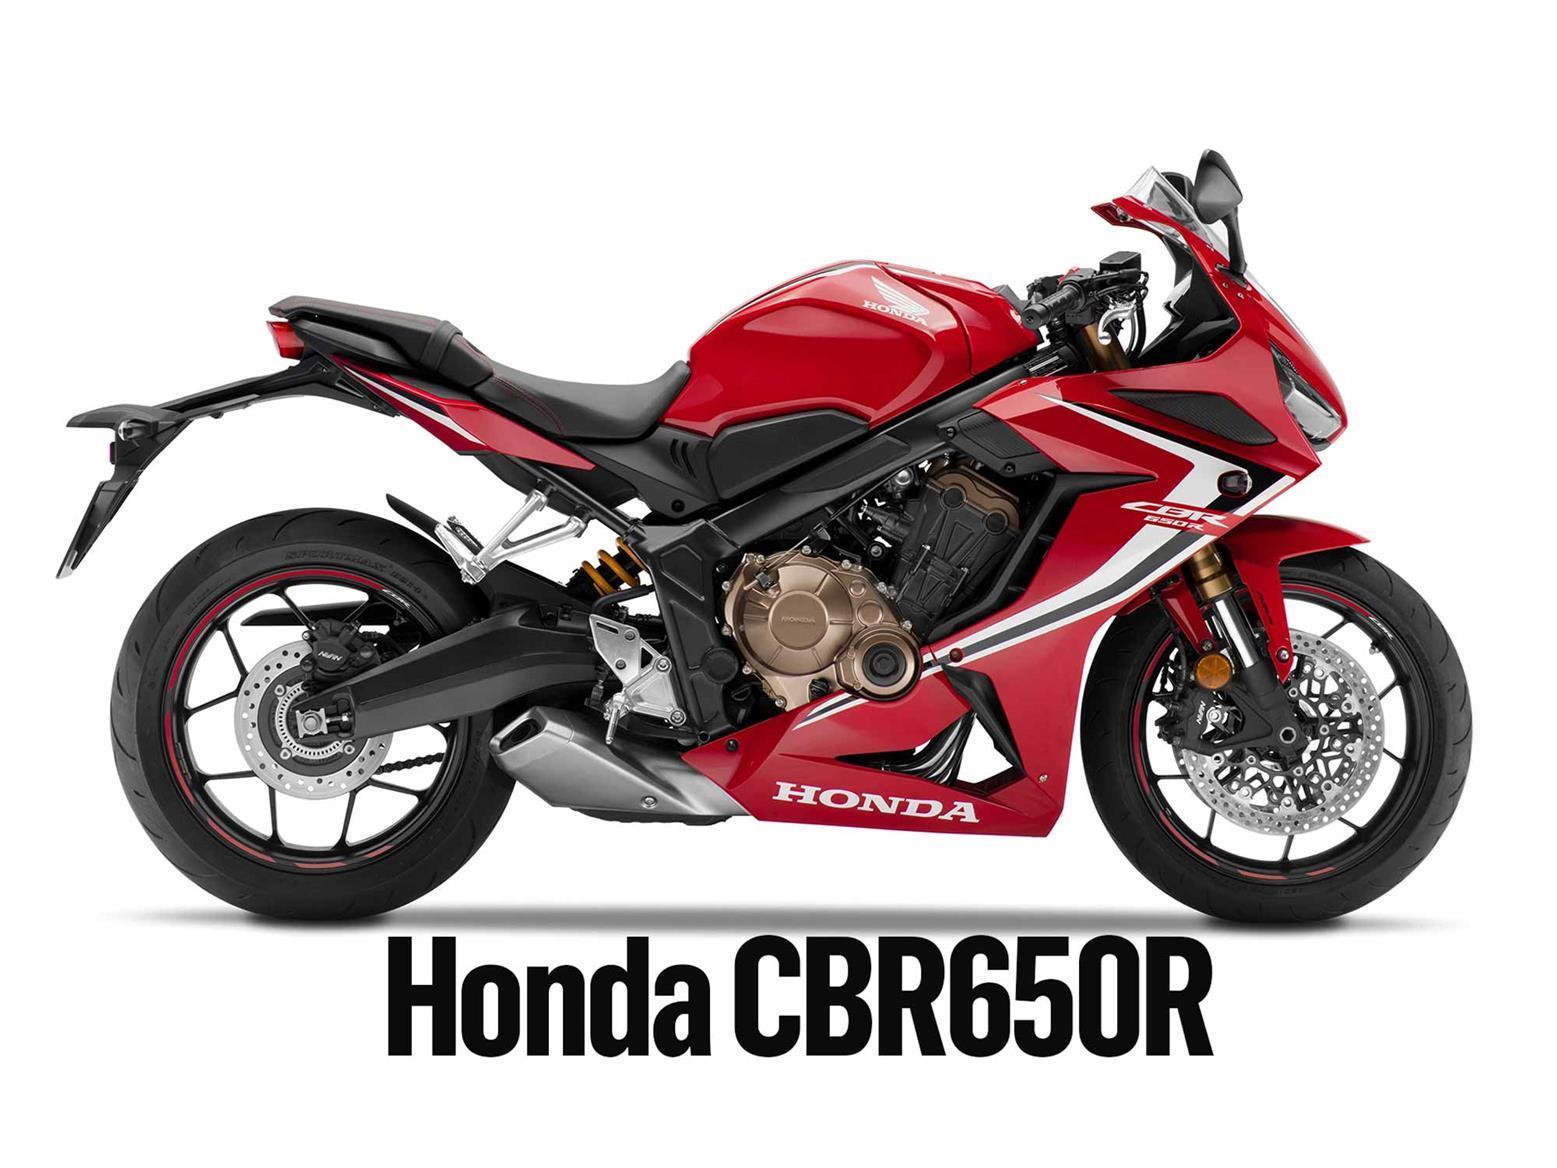 Read MCN's detailed Honda CBR650R long-term test review